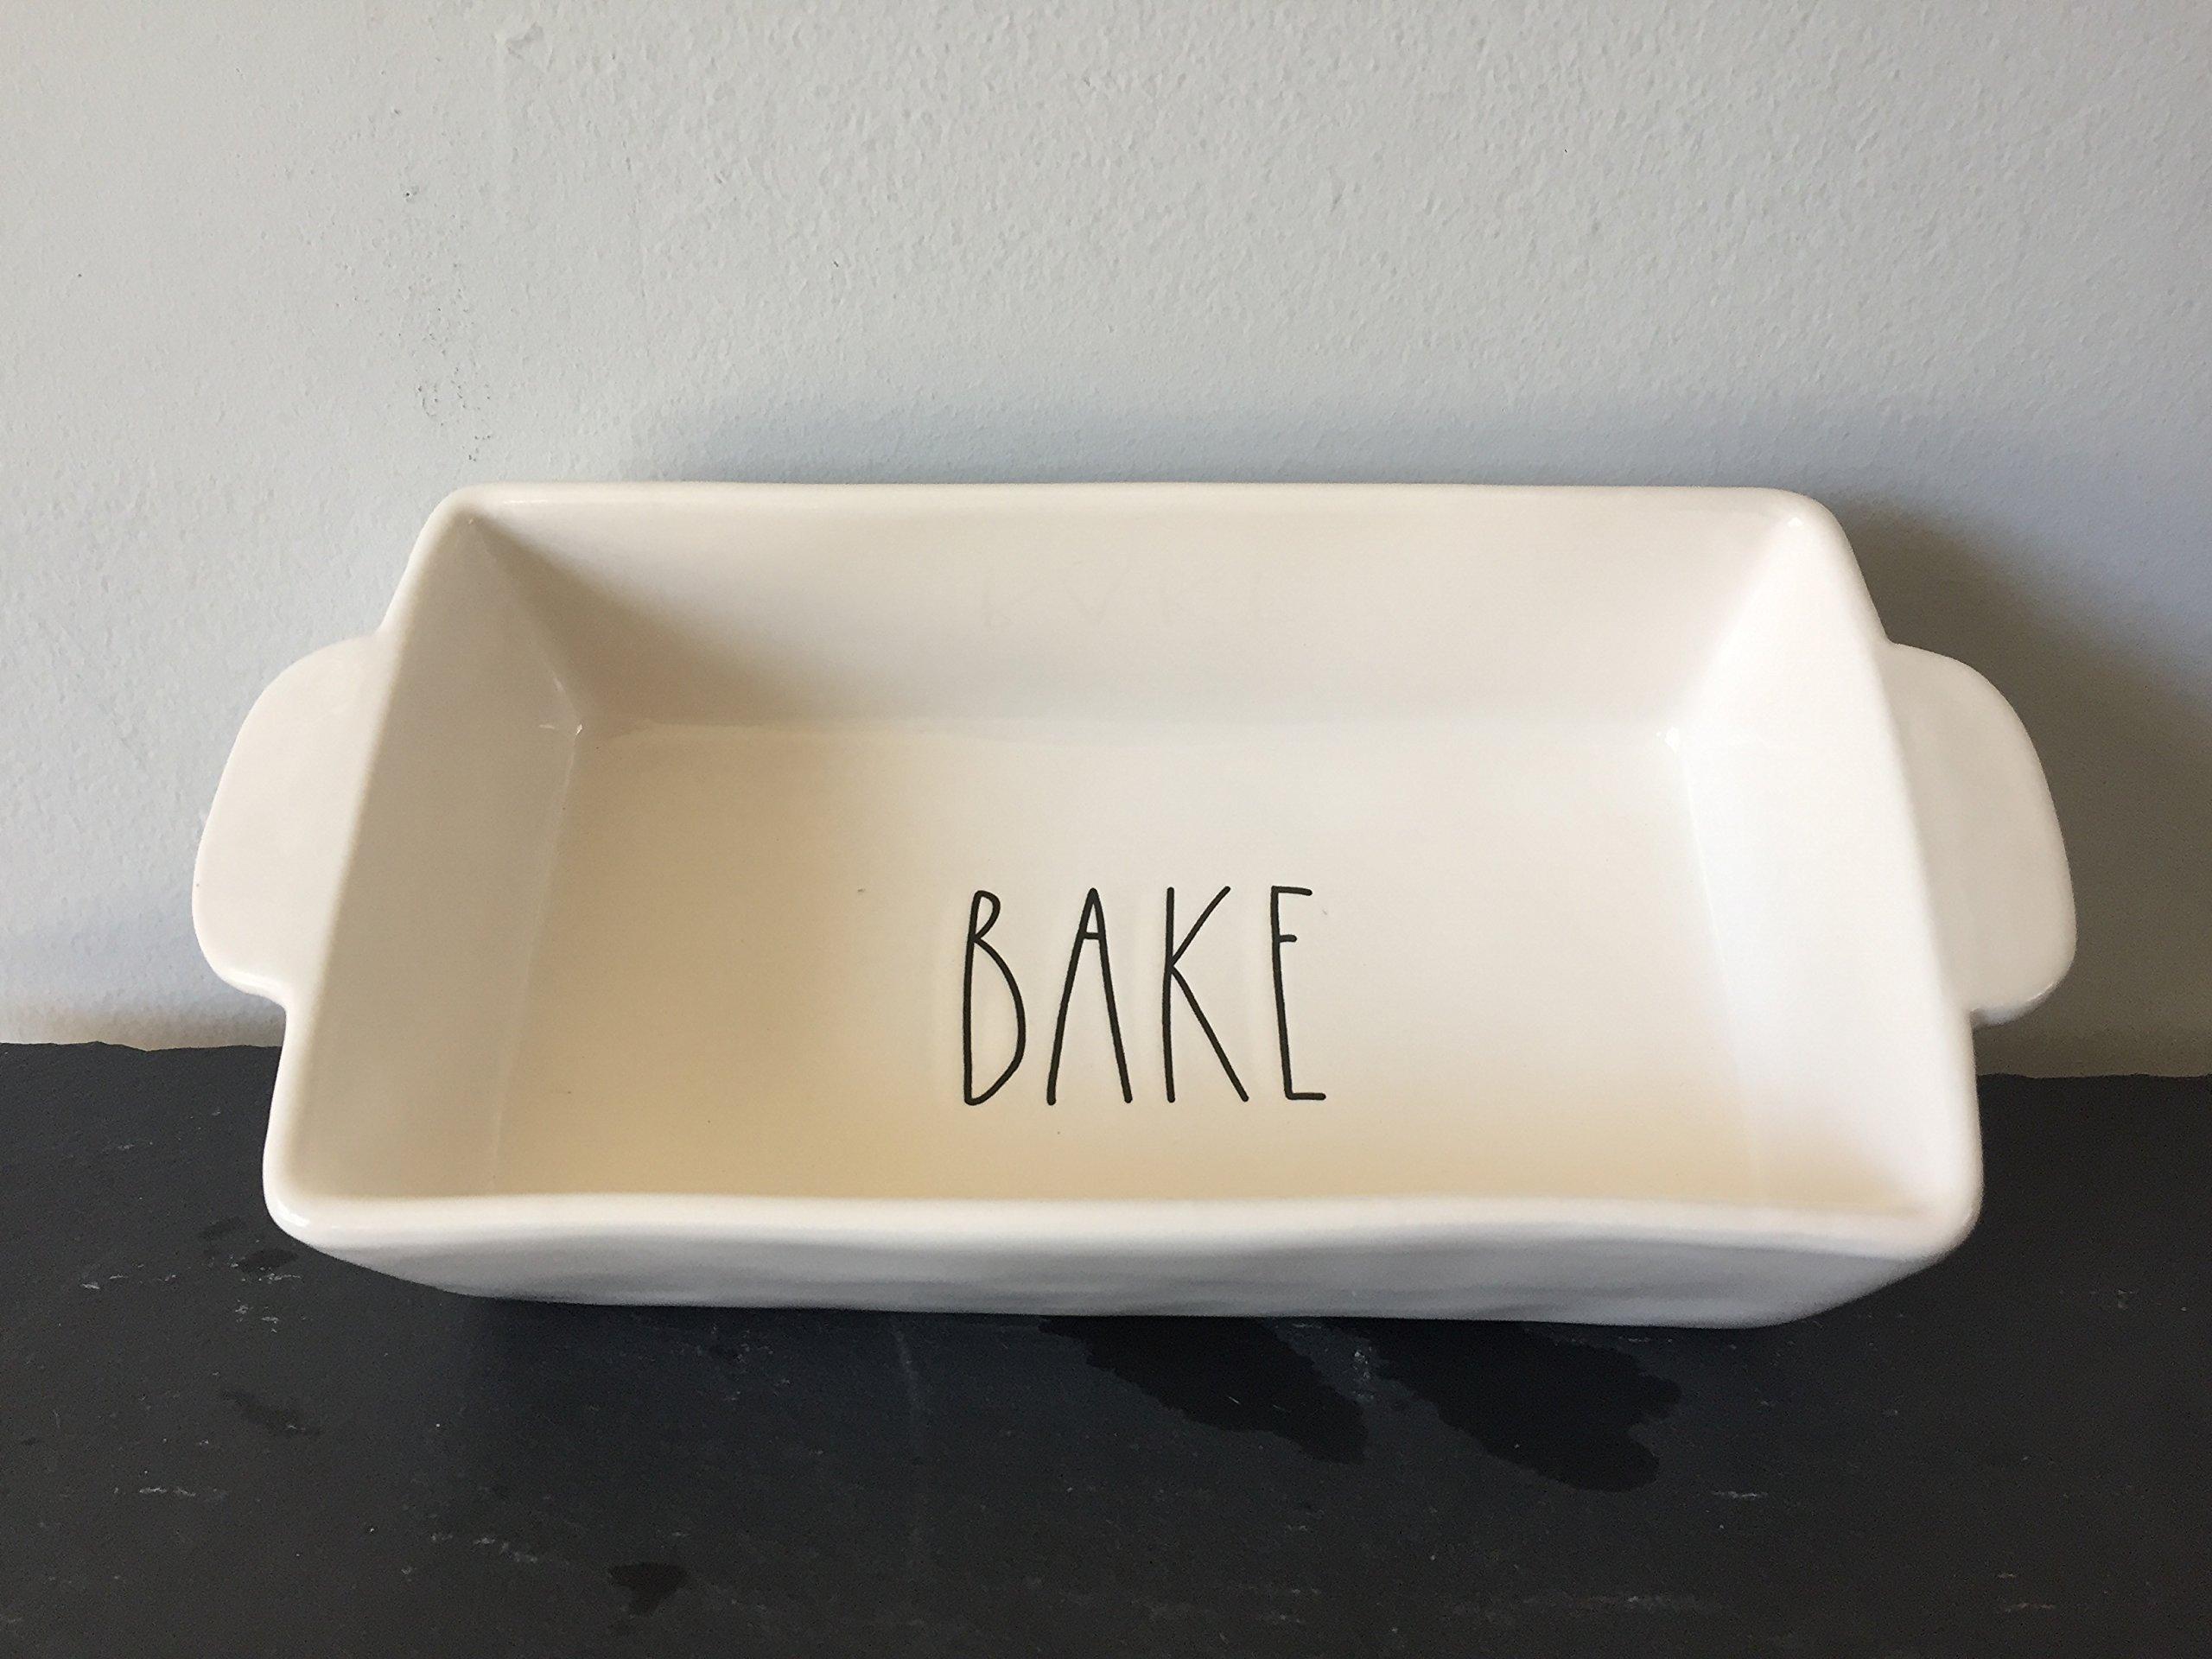 Rae Dunn Bake Dish 9x5 by Rae Dunn - Magenta (Image #2)